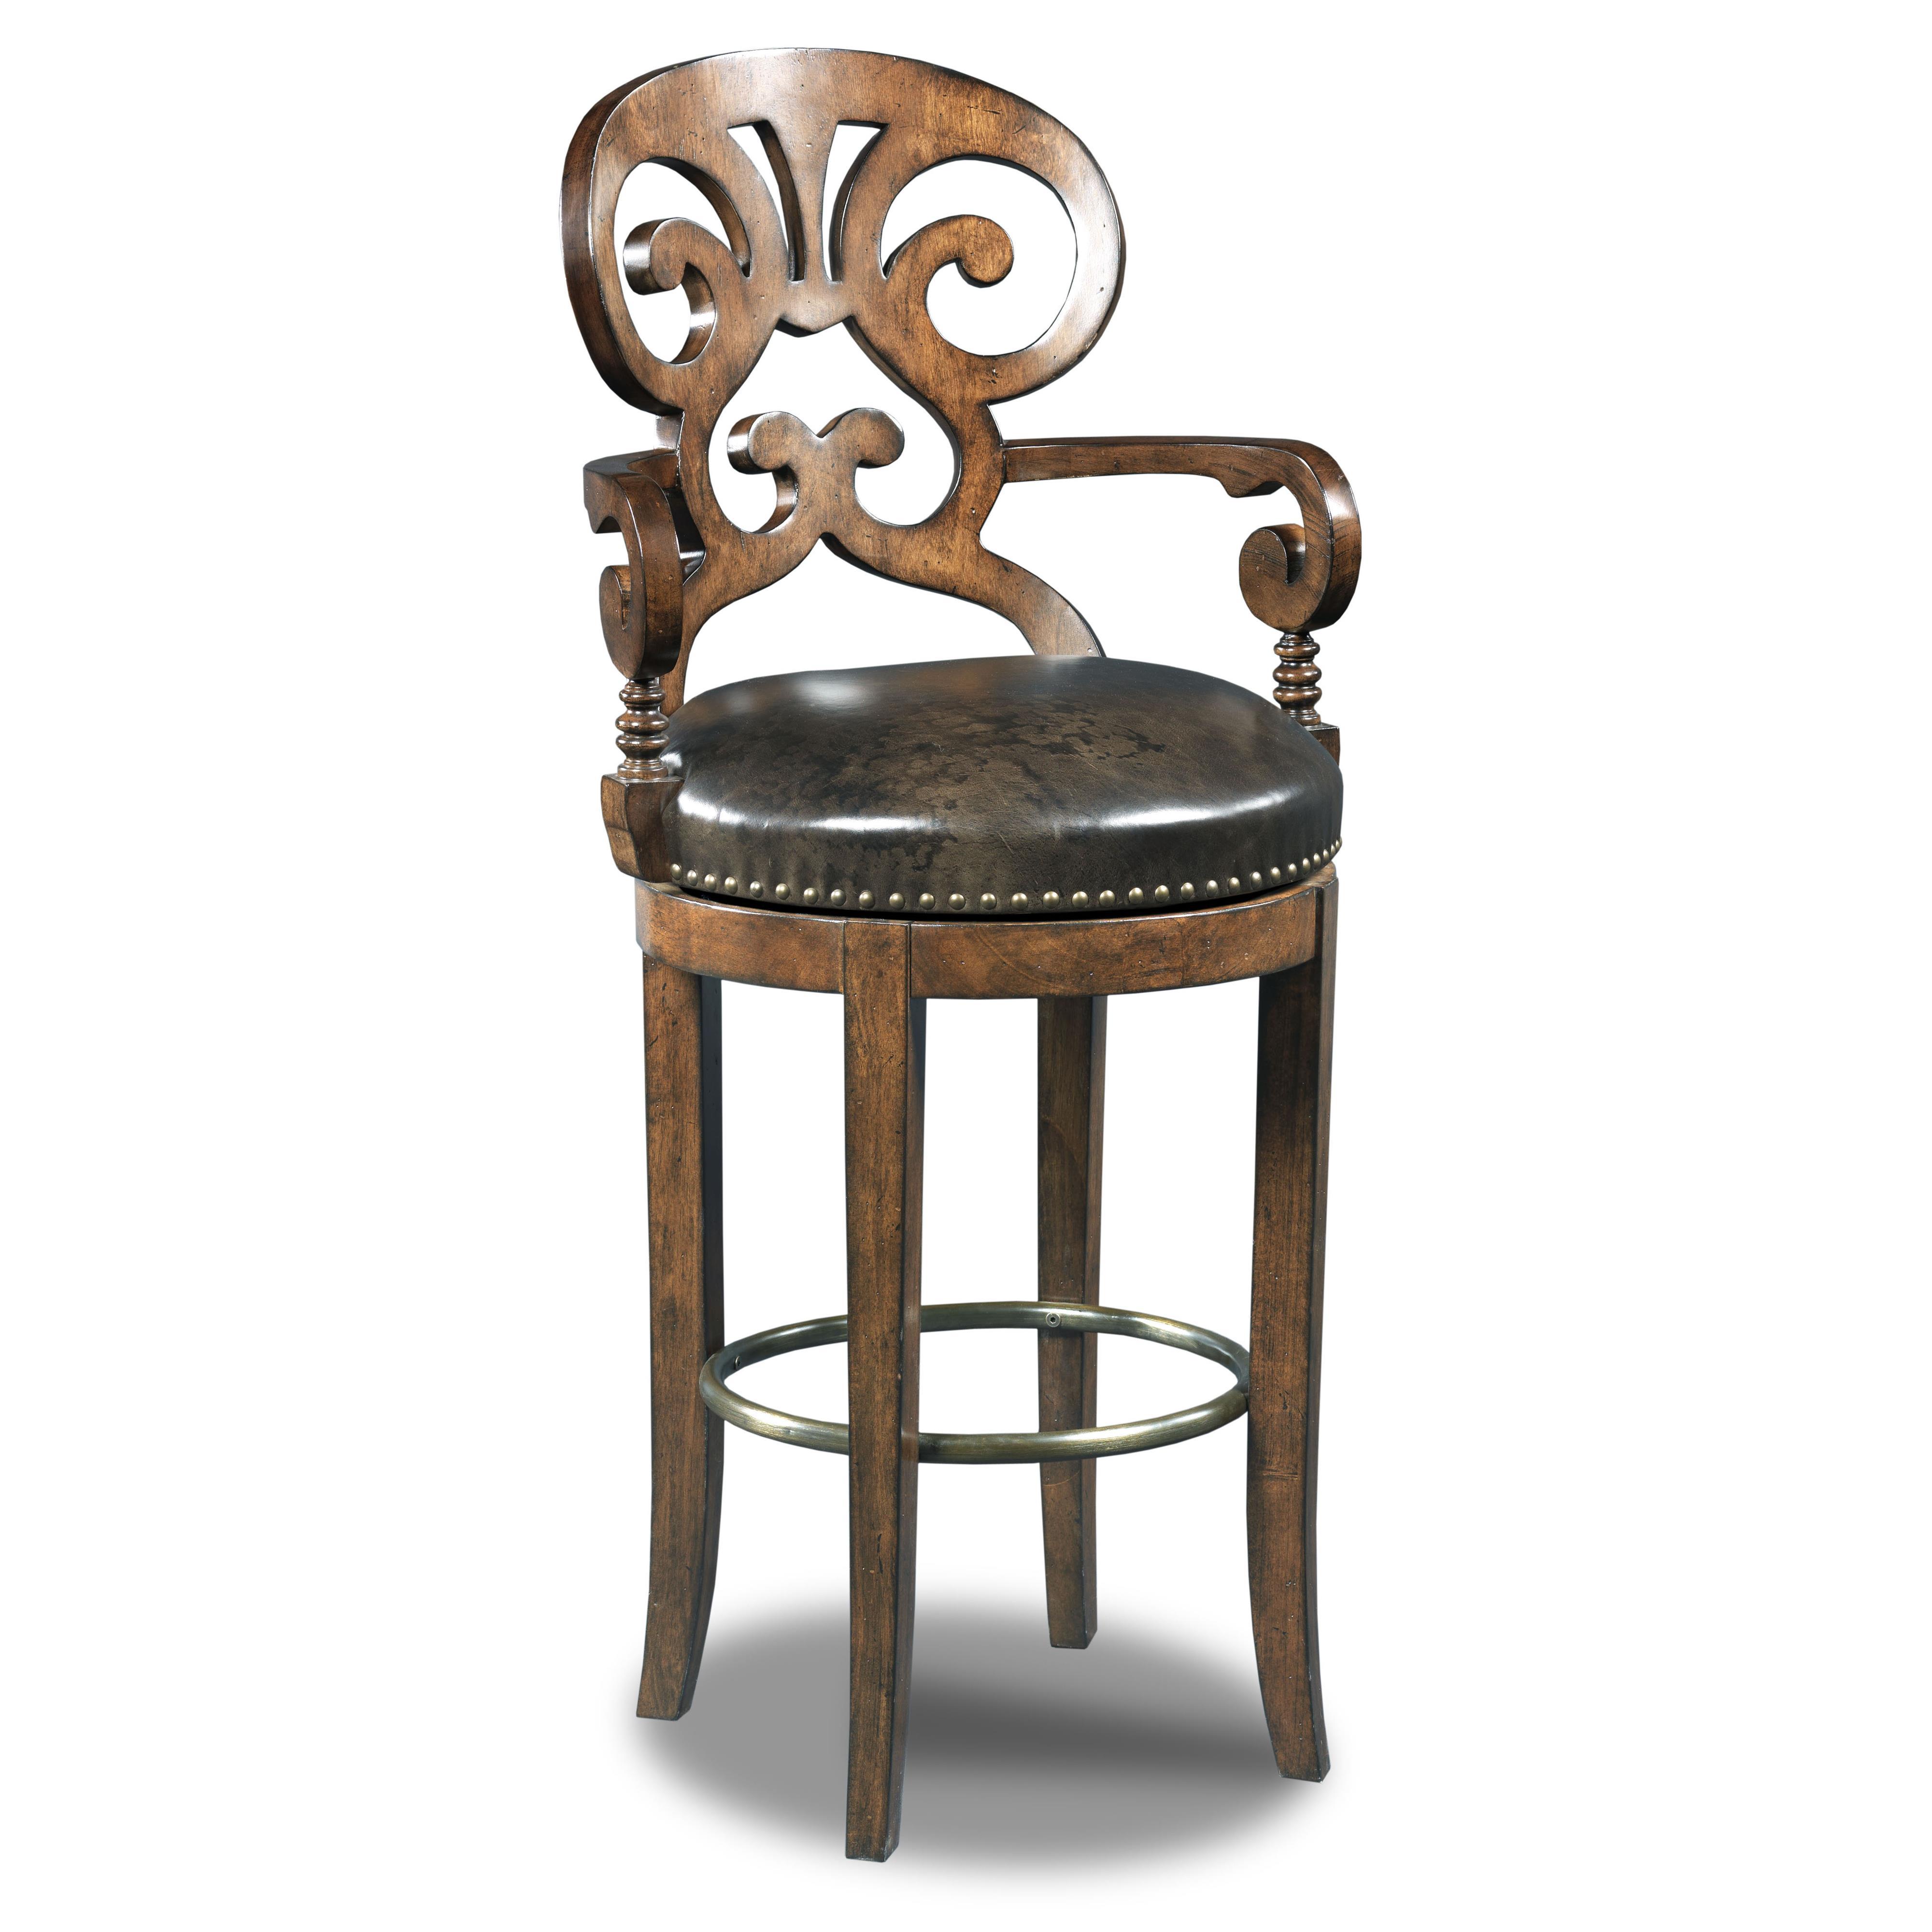 Hooker Furniture Stools Dark Jameson Traditional Leather Barstool - Item Number: 300-20016